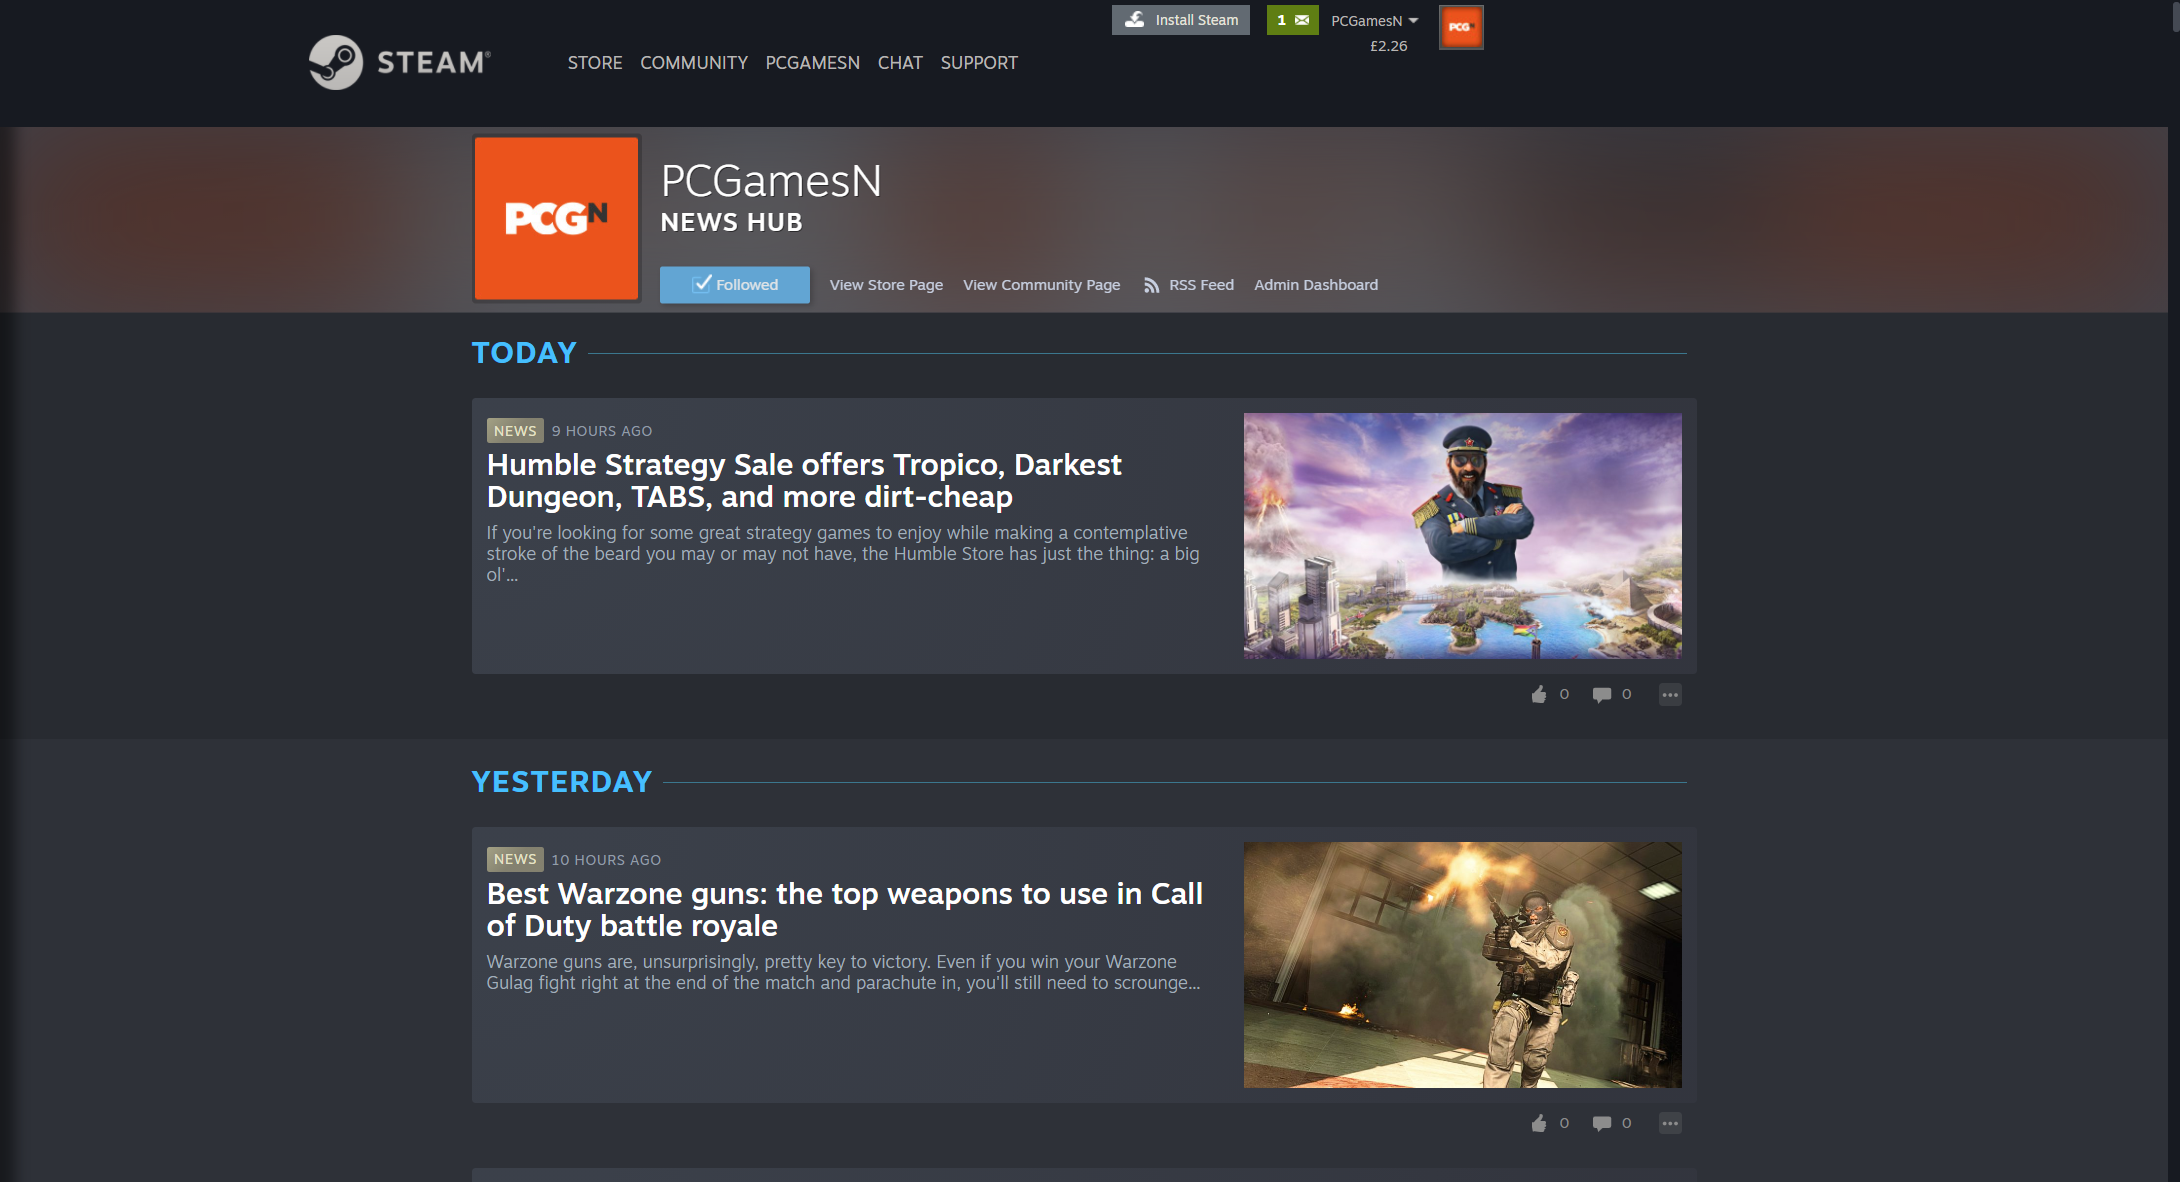 Follow us on Steam News Hub